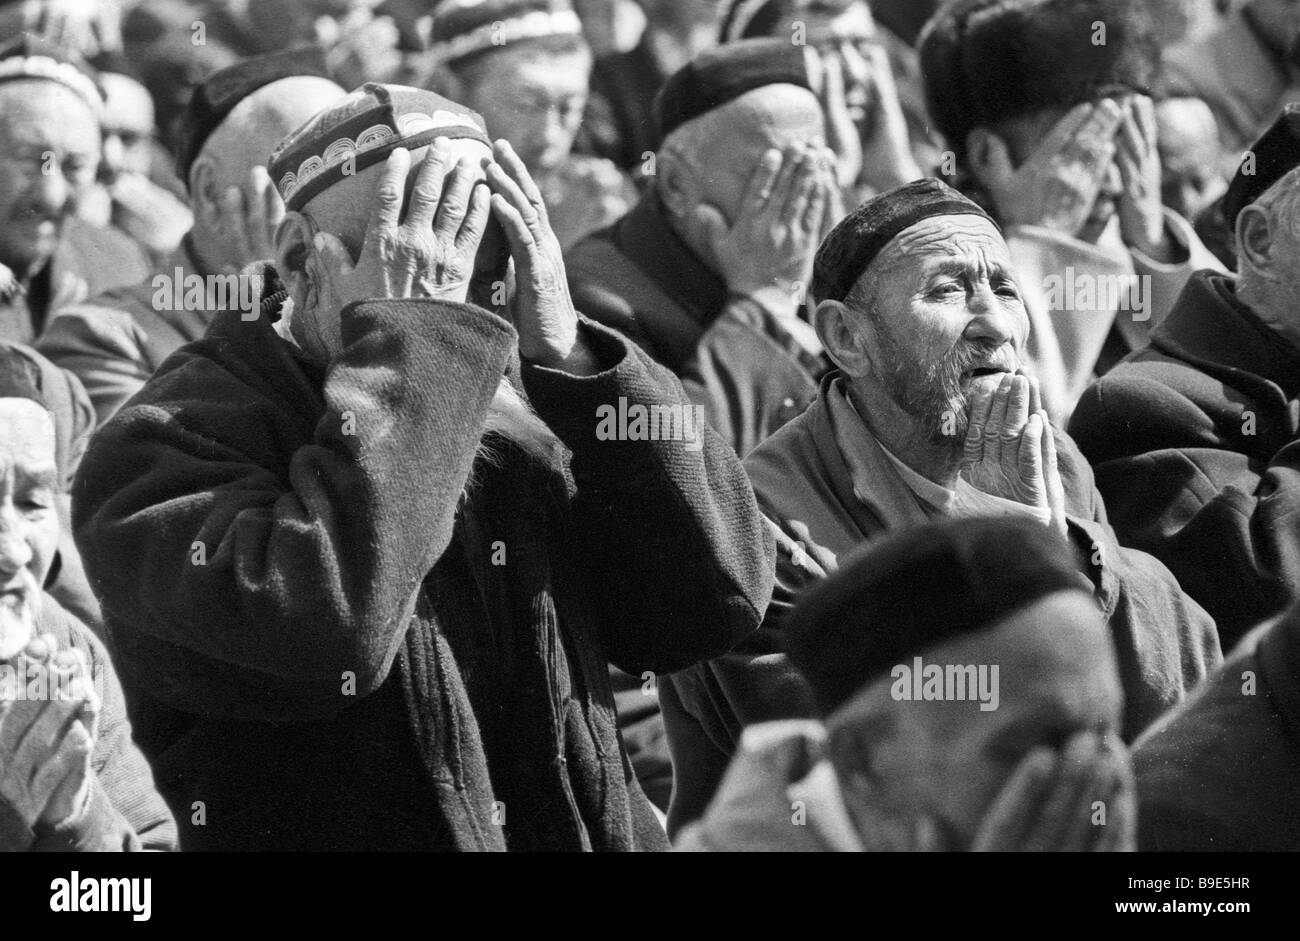 Muslims praying in the mosque Tashkent - Stock Image